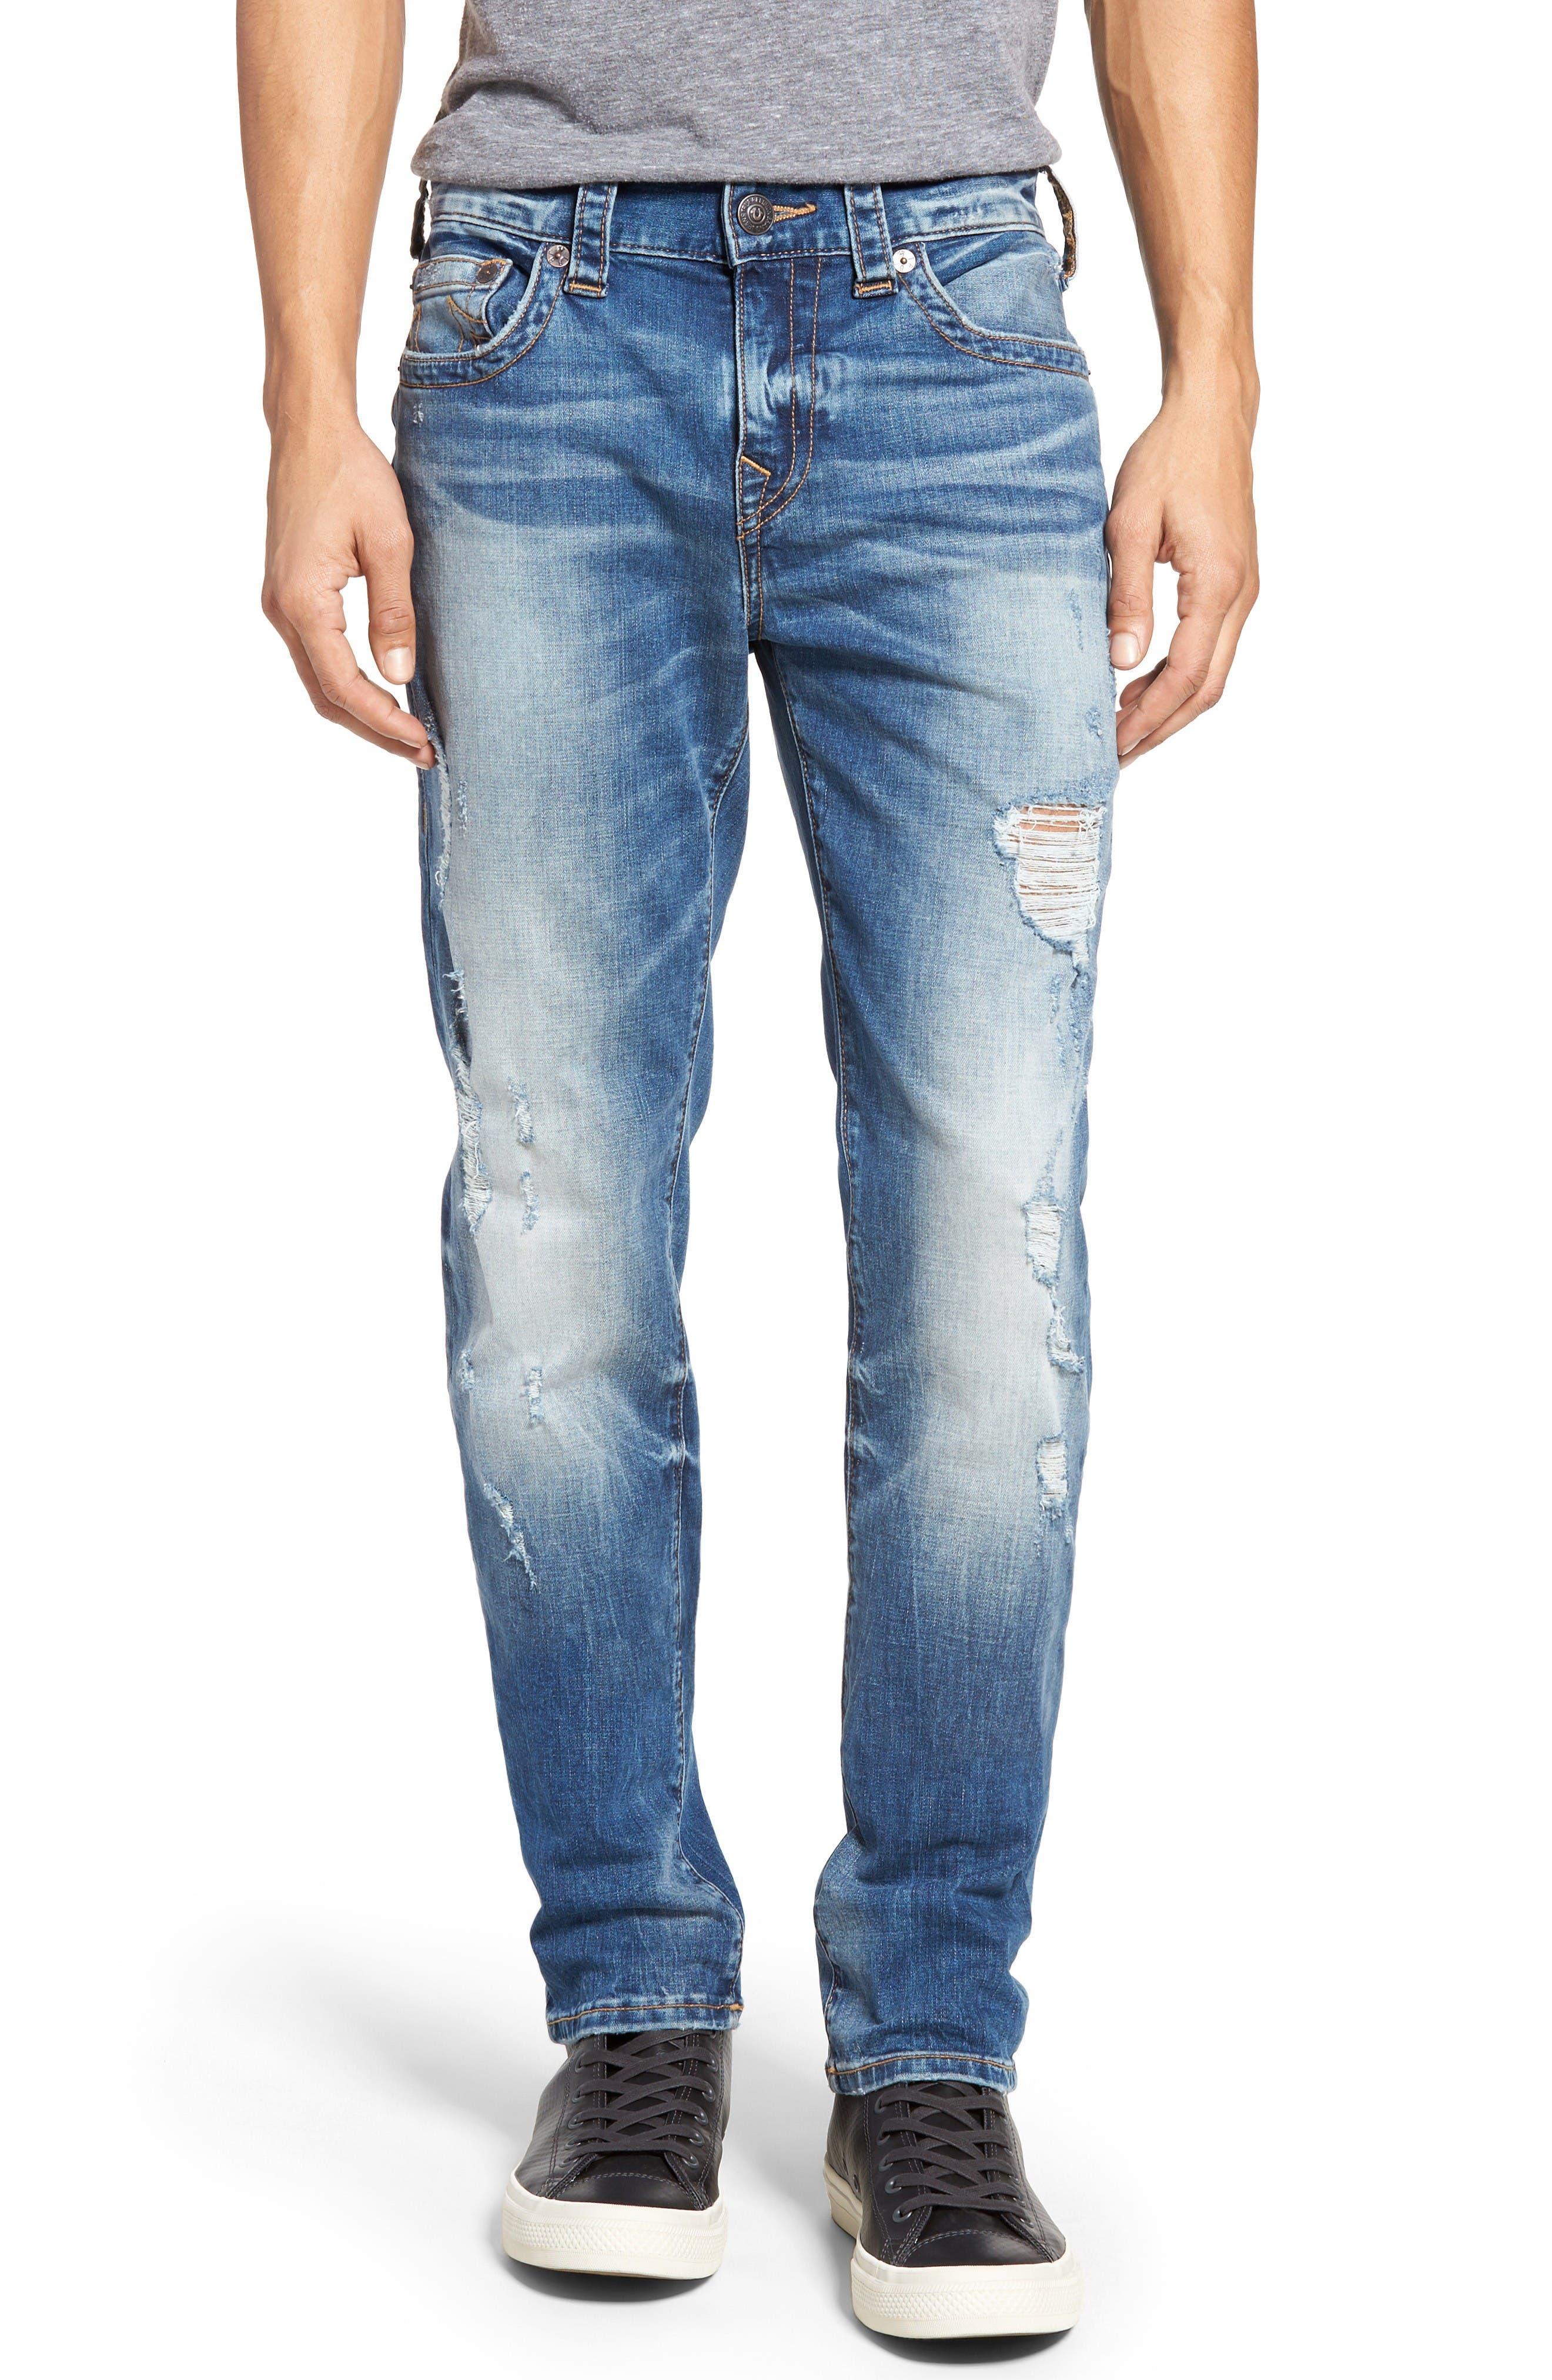 True Religion Brand Jeans Rocco Skinny Fit Jeans (DQFM Worn Rebellion) (Regular & Big)